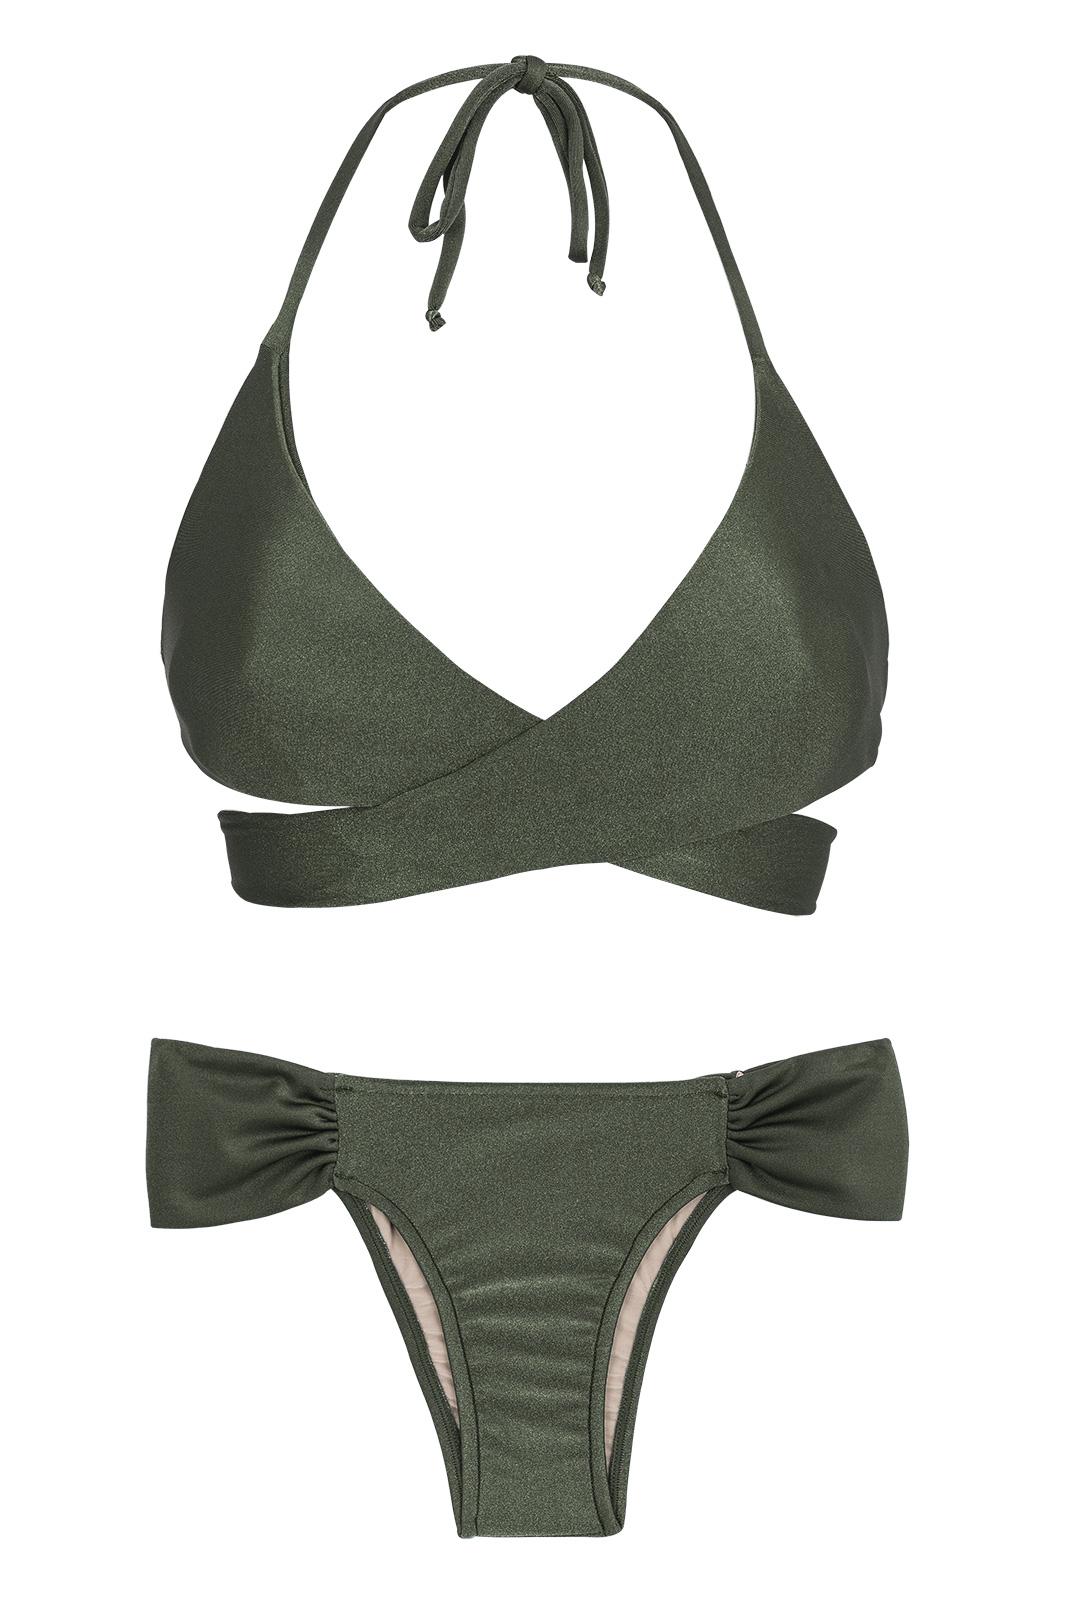 4e435ad5cd4691 Two Piece Swimwear Khaki Wrap Bra Bikini - Croco Transpassado